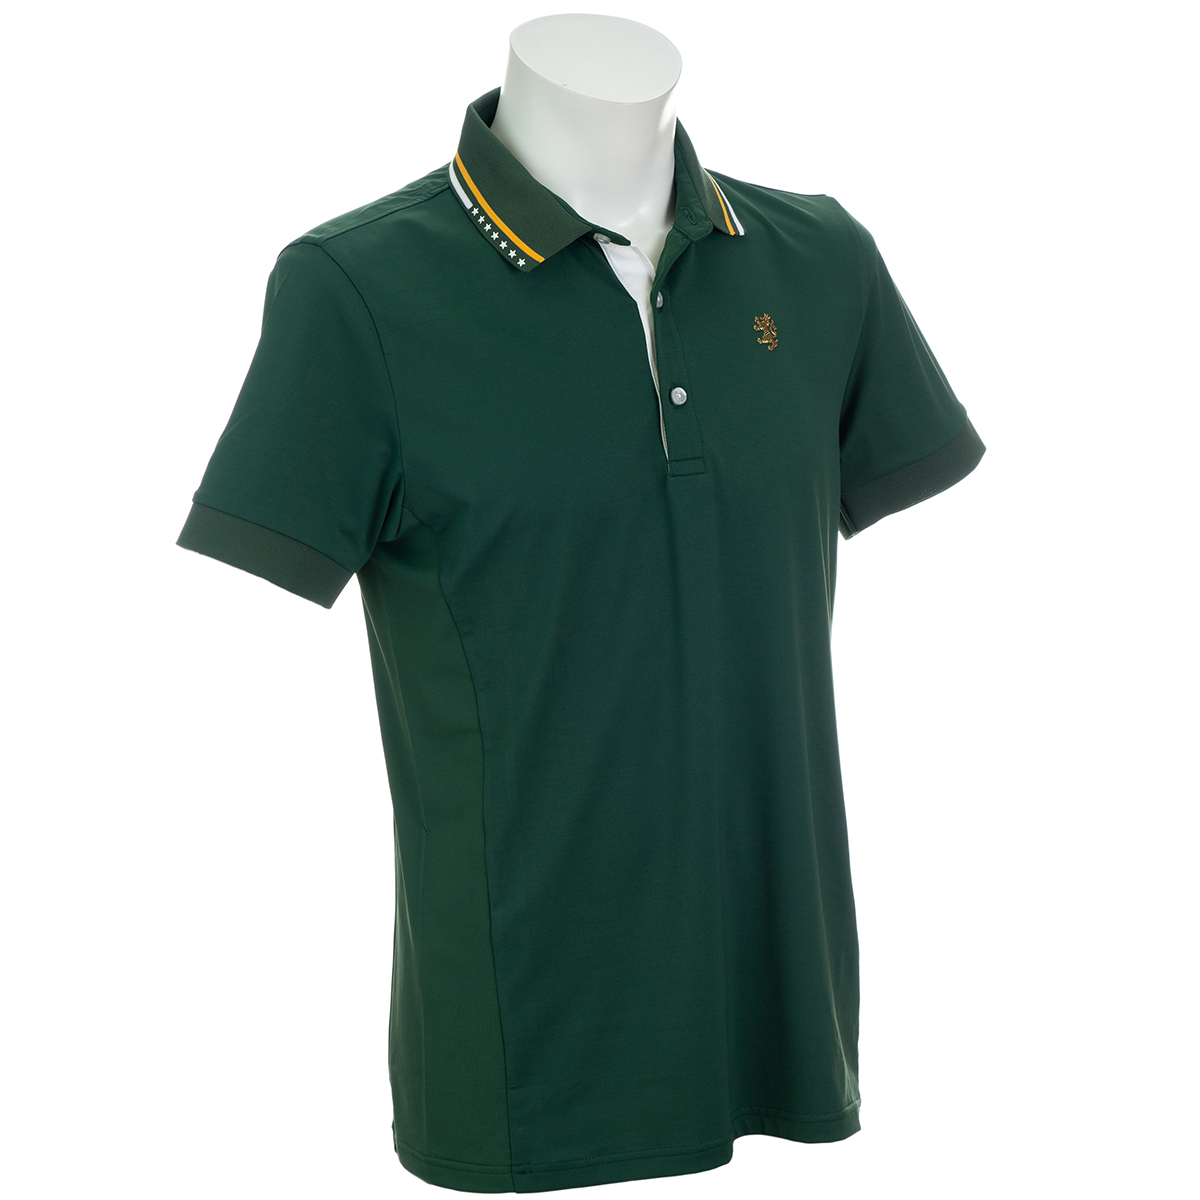 7W ストレッチ半袖ポロシャツ